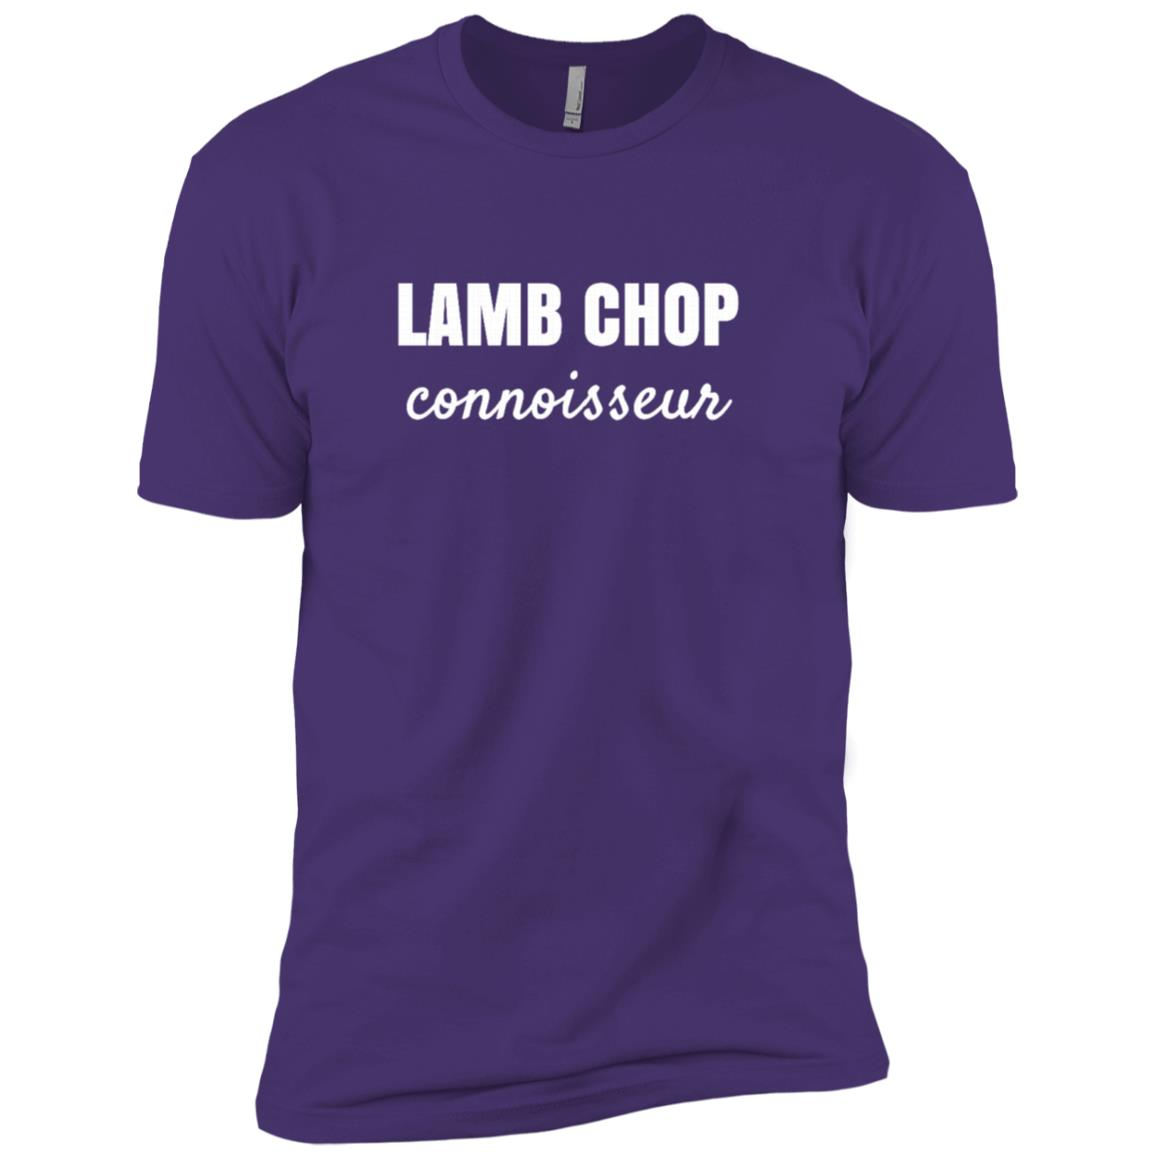 Lamb Chop Connoisseur Fun Meat Lovers Men Short Sleeve T-Shirt